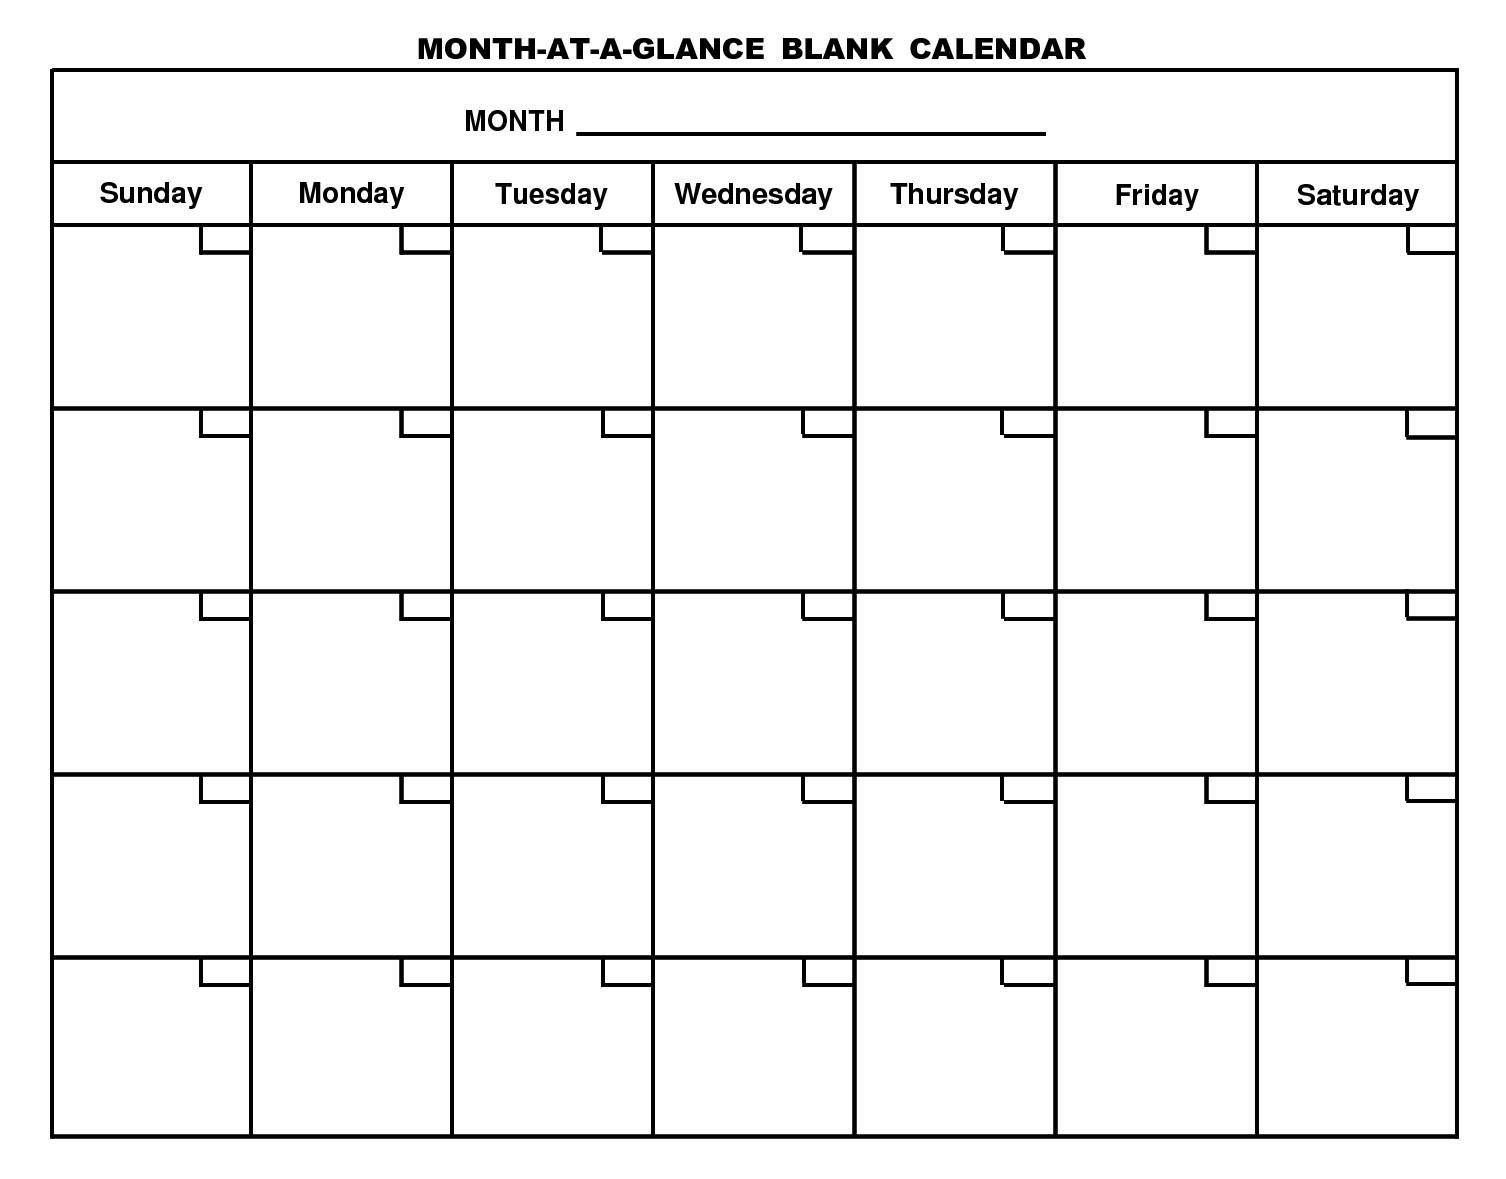 Blank Monthly Calendars To Print - Calendar Inspiration Design  Large Printable Calendar